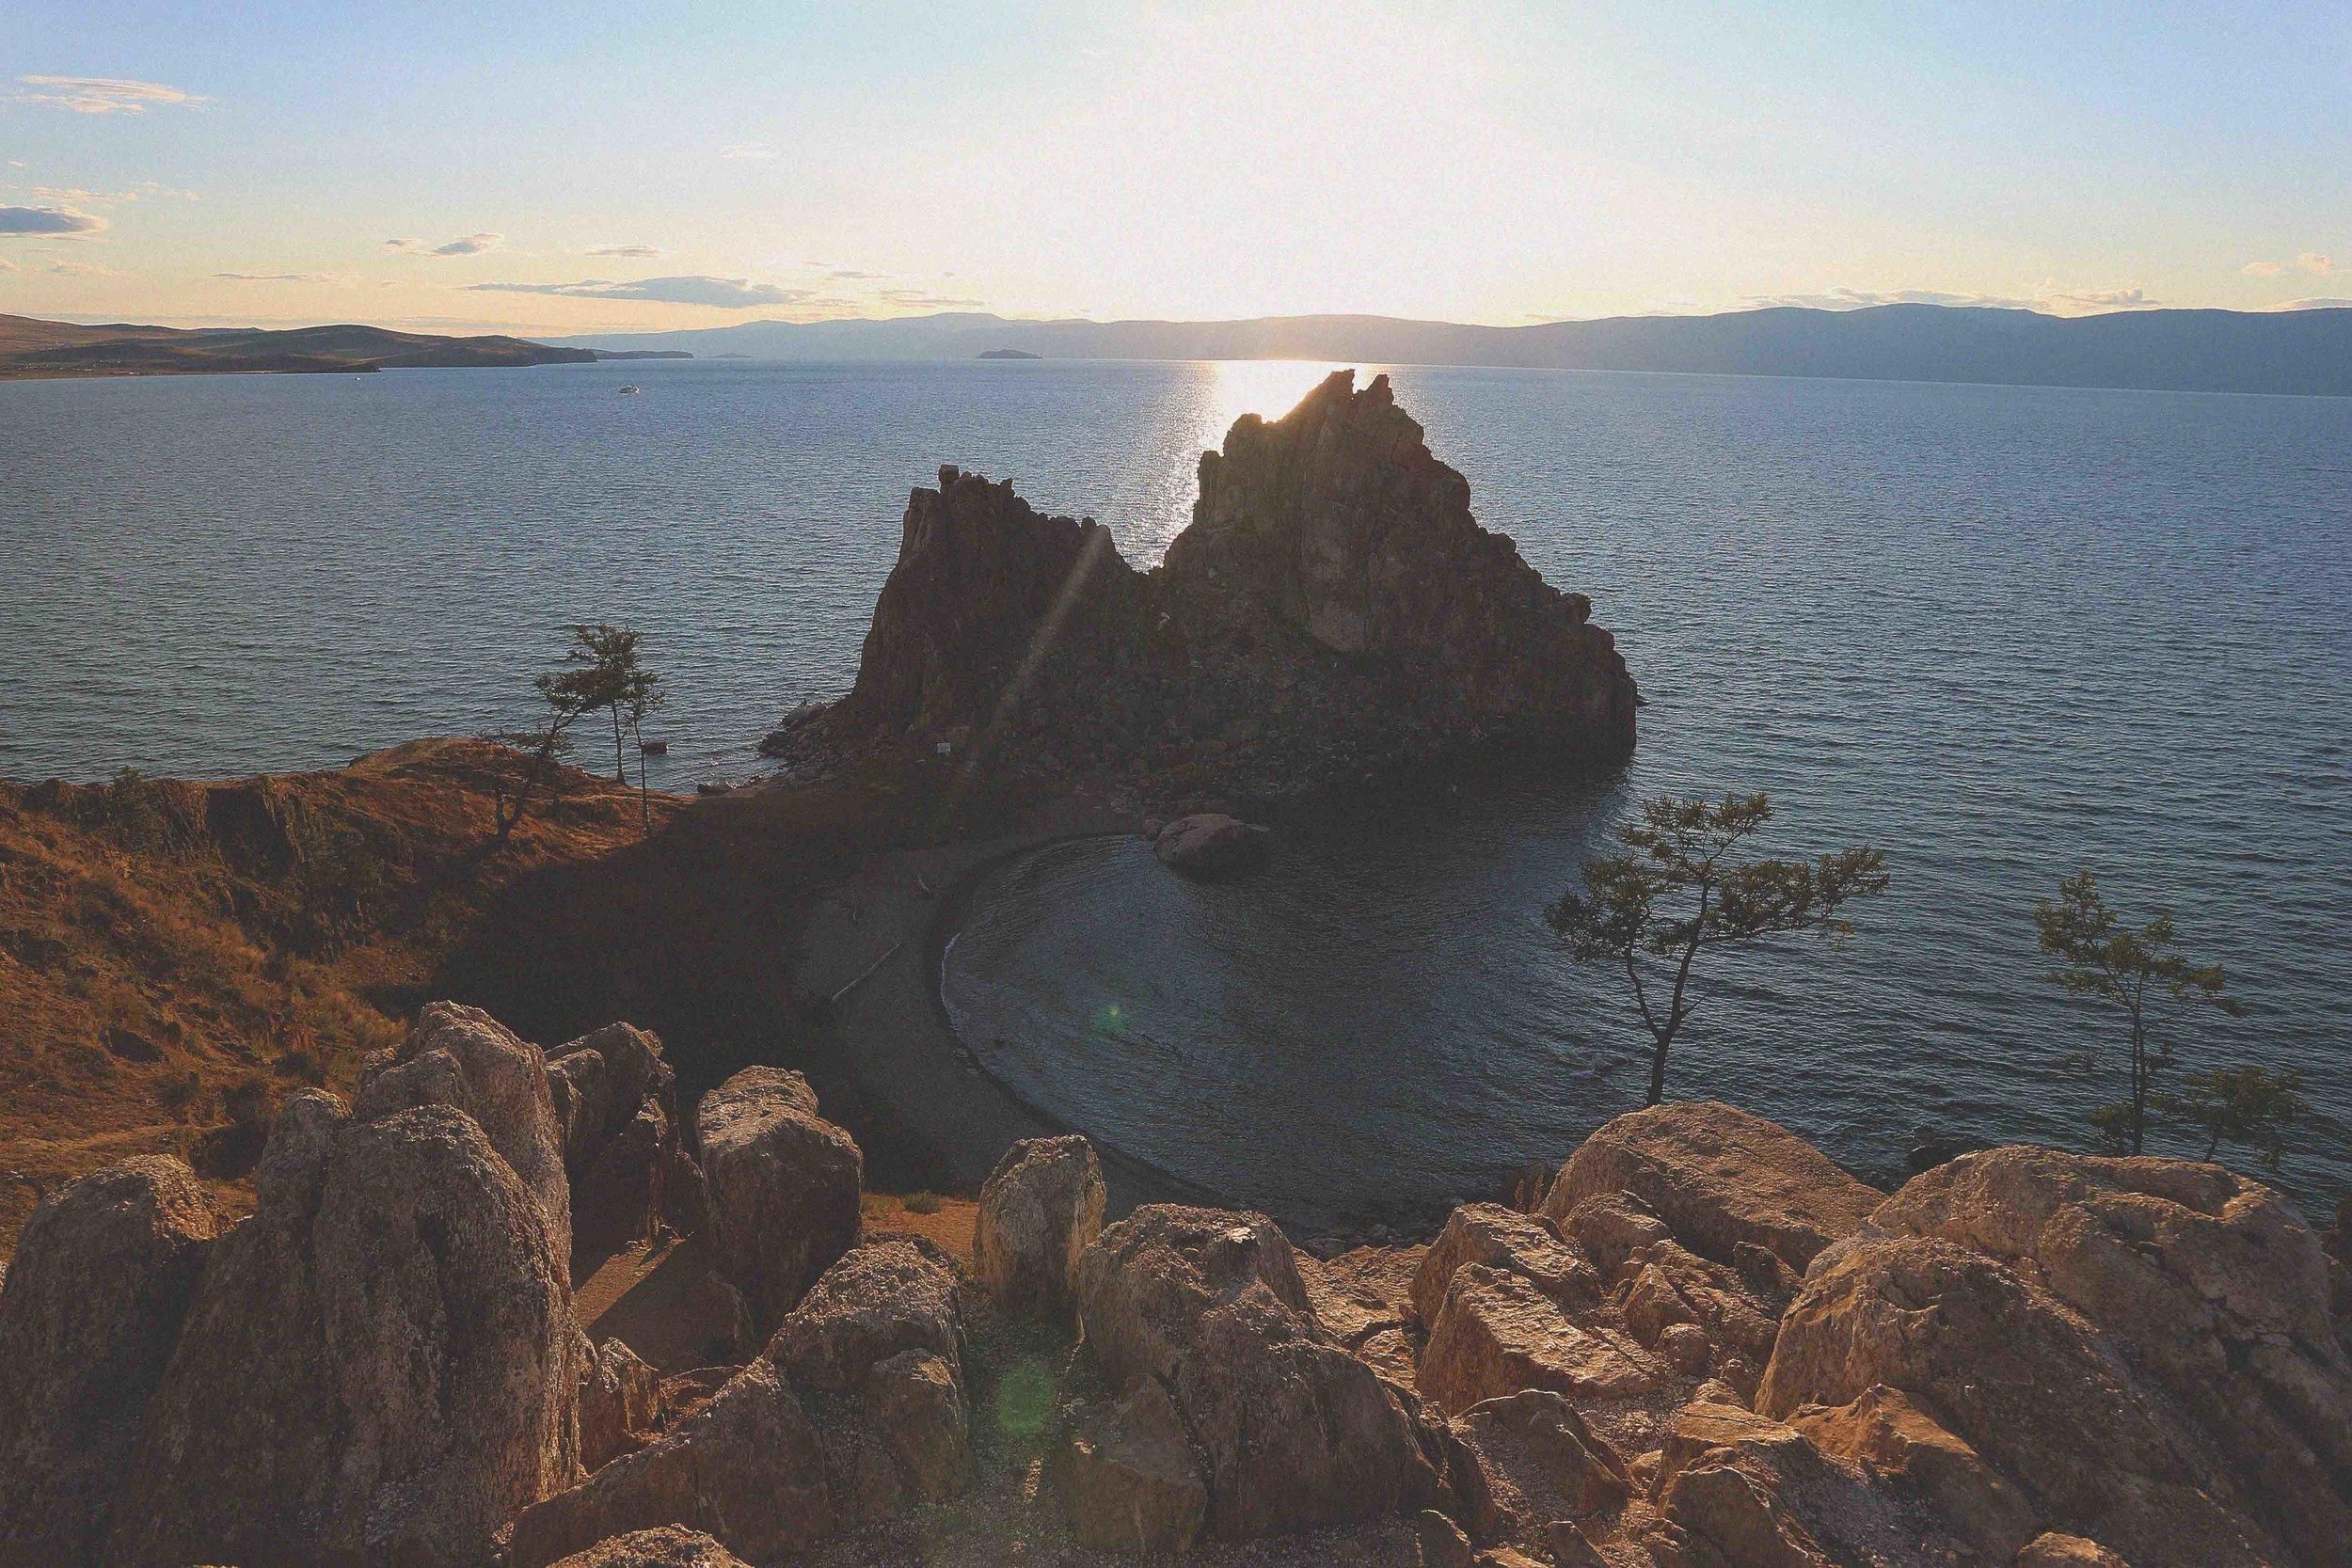 Shaman rock on Olkhon Island